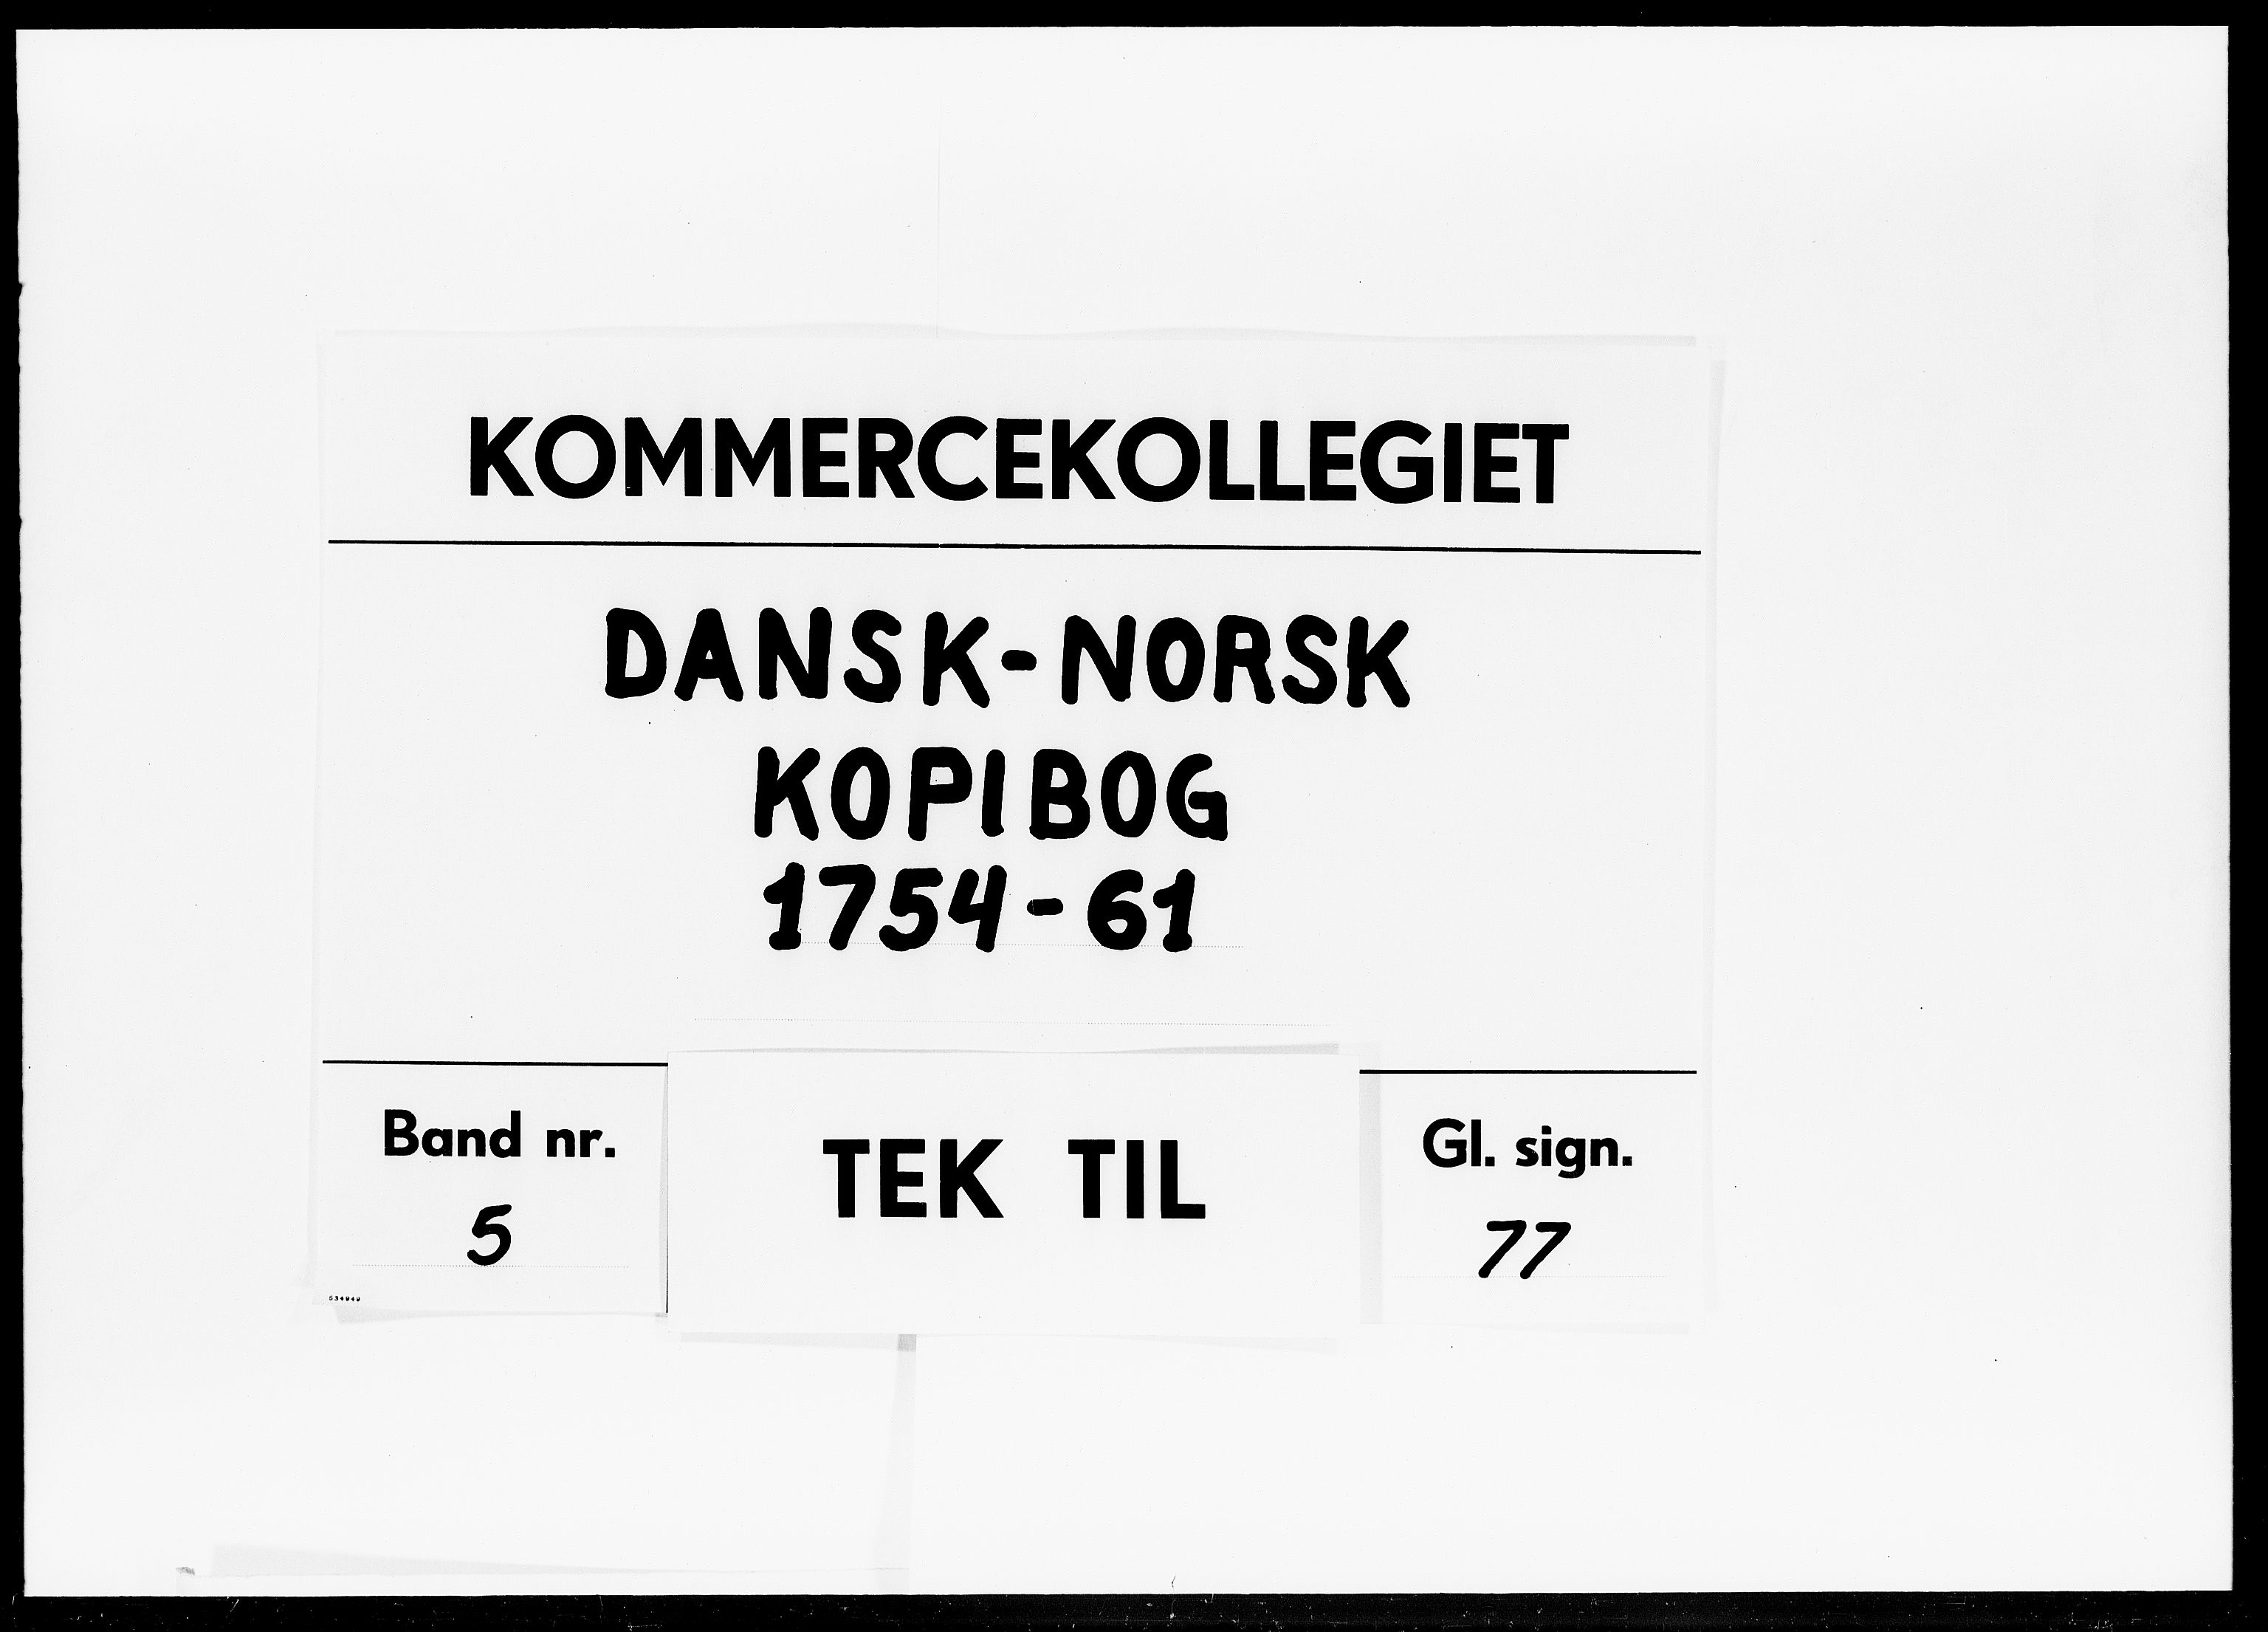 DRA, Kommercekollegiet, Dansk-Norske Sekretariat, -/45: Dansk-Norsk kopibog, 1754-1761